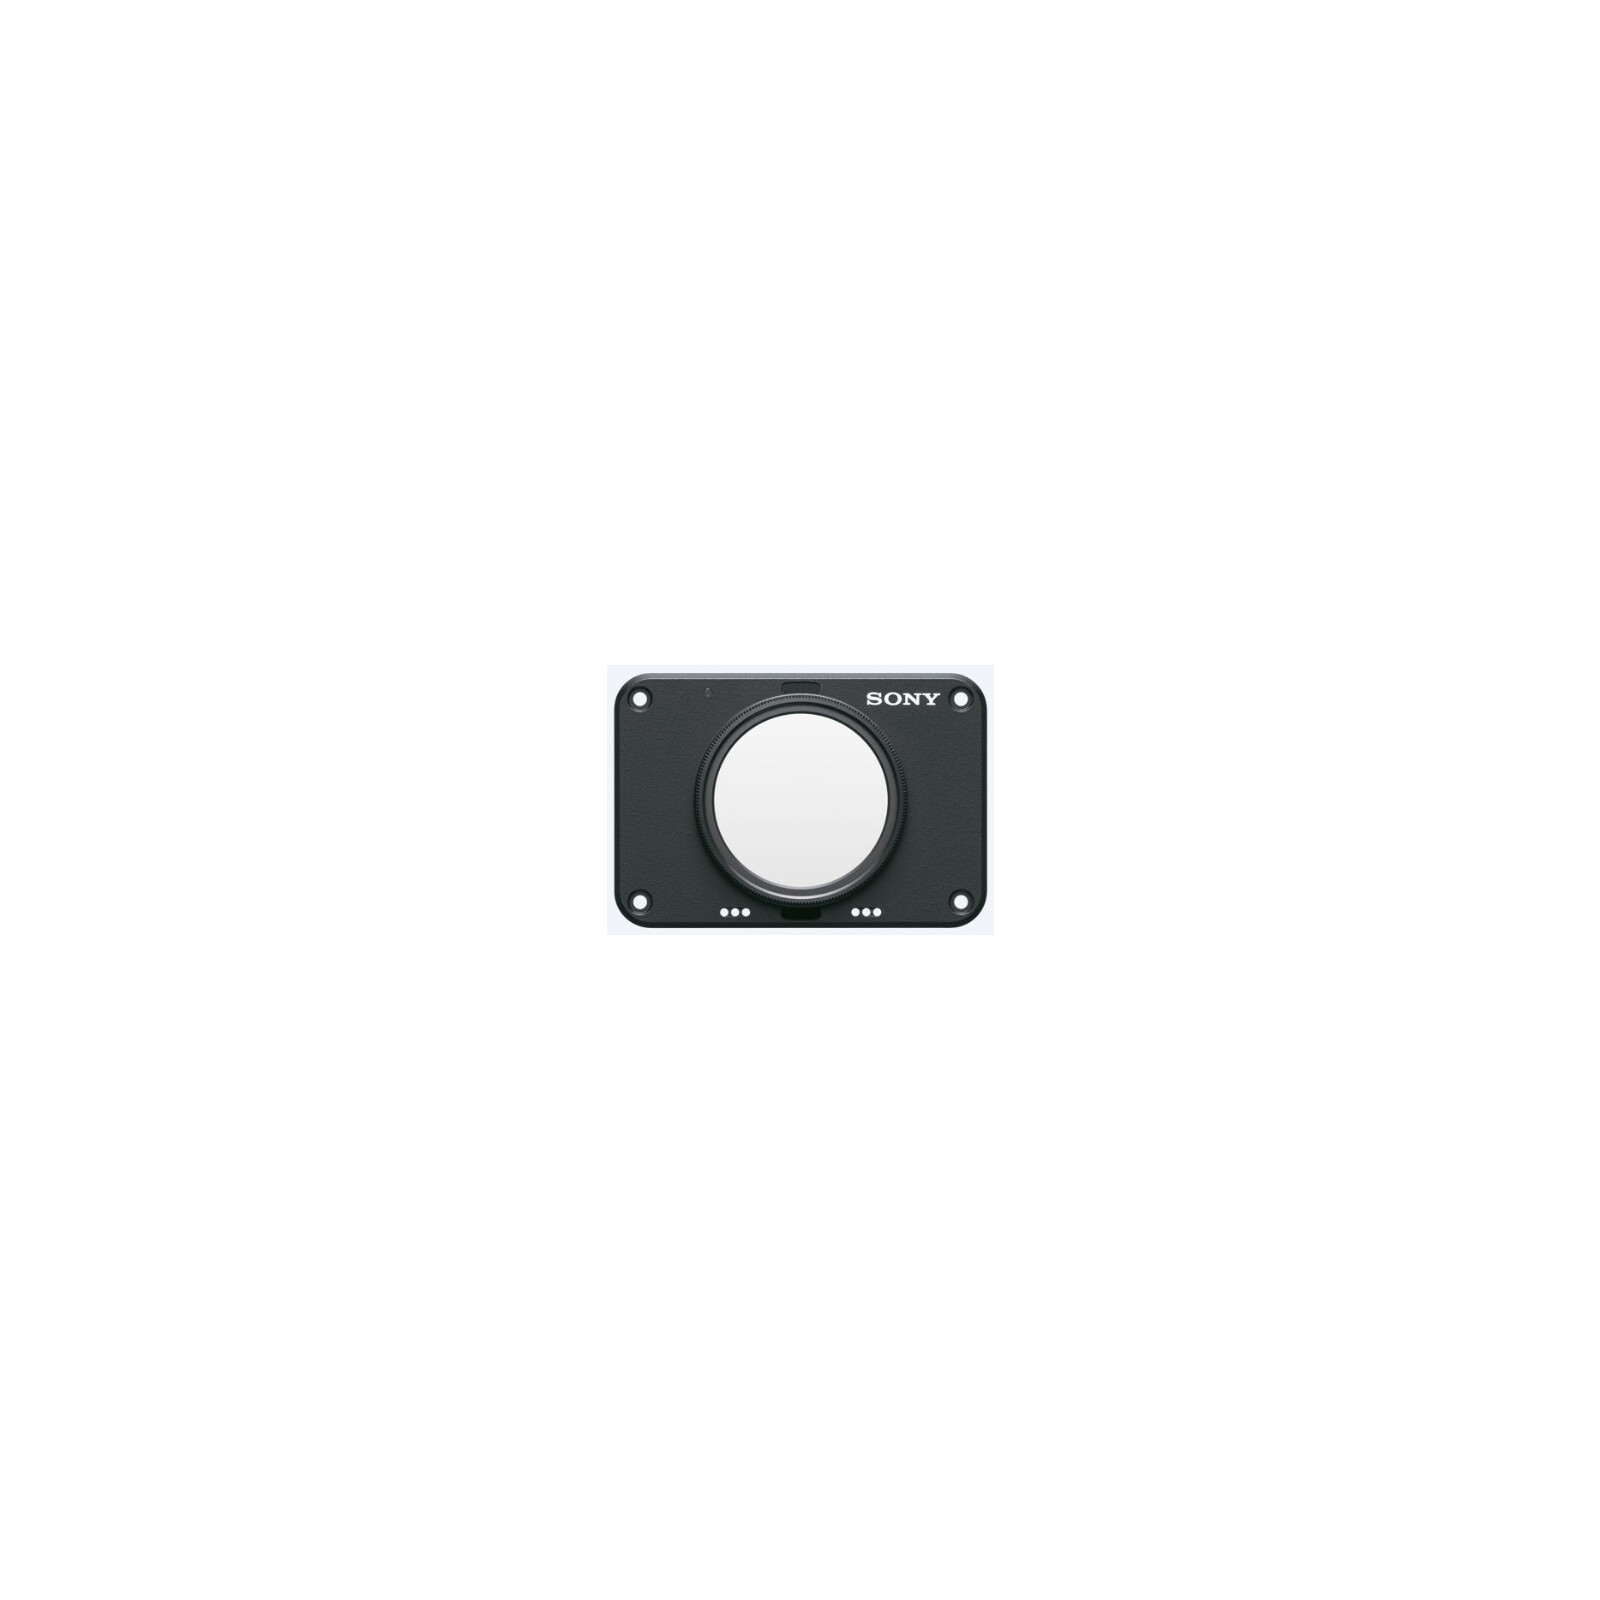 Sony VF-A305R1 Filter Adapter Kit